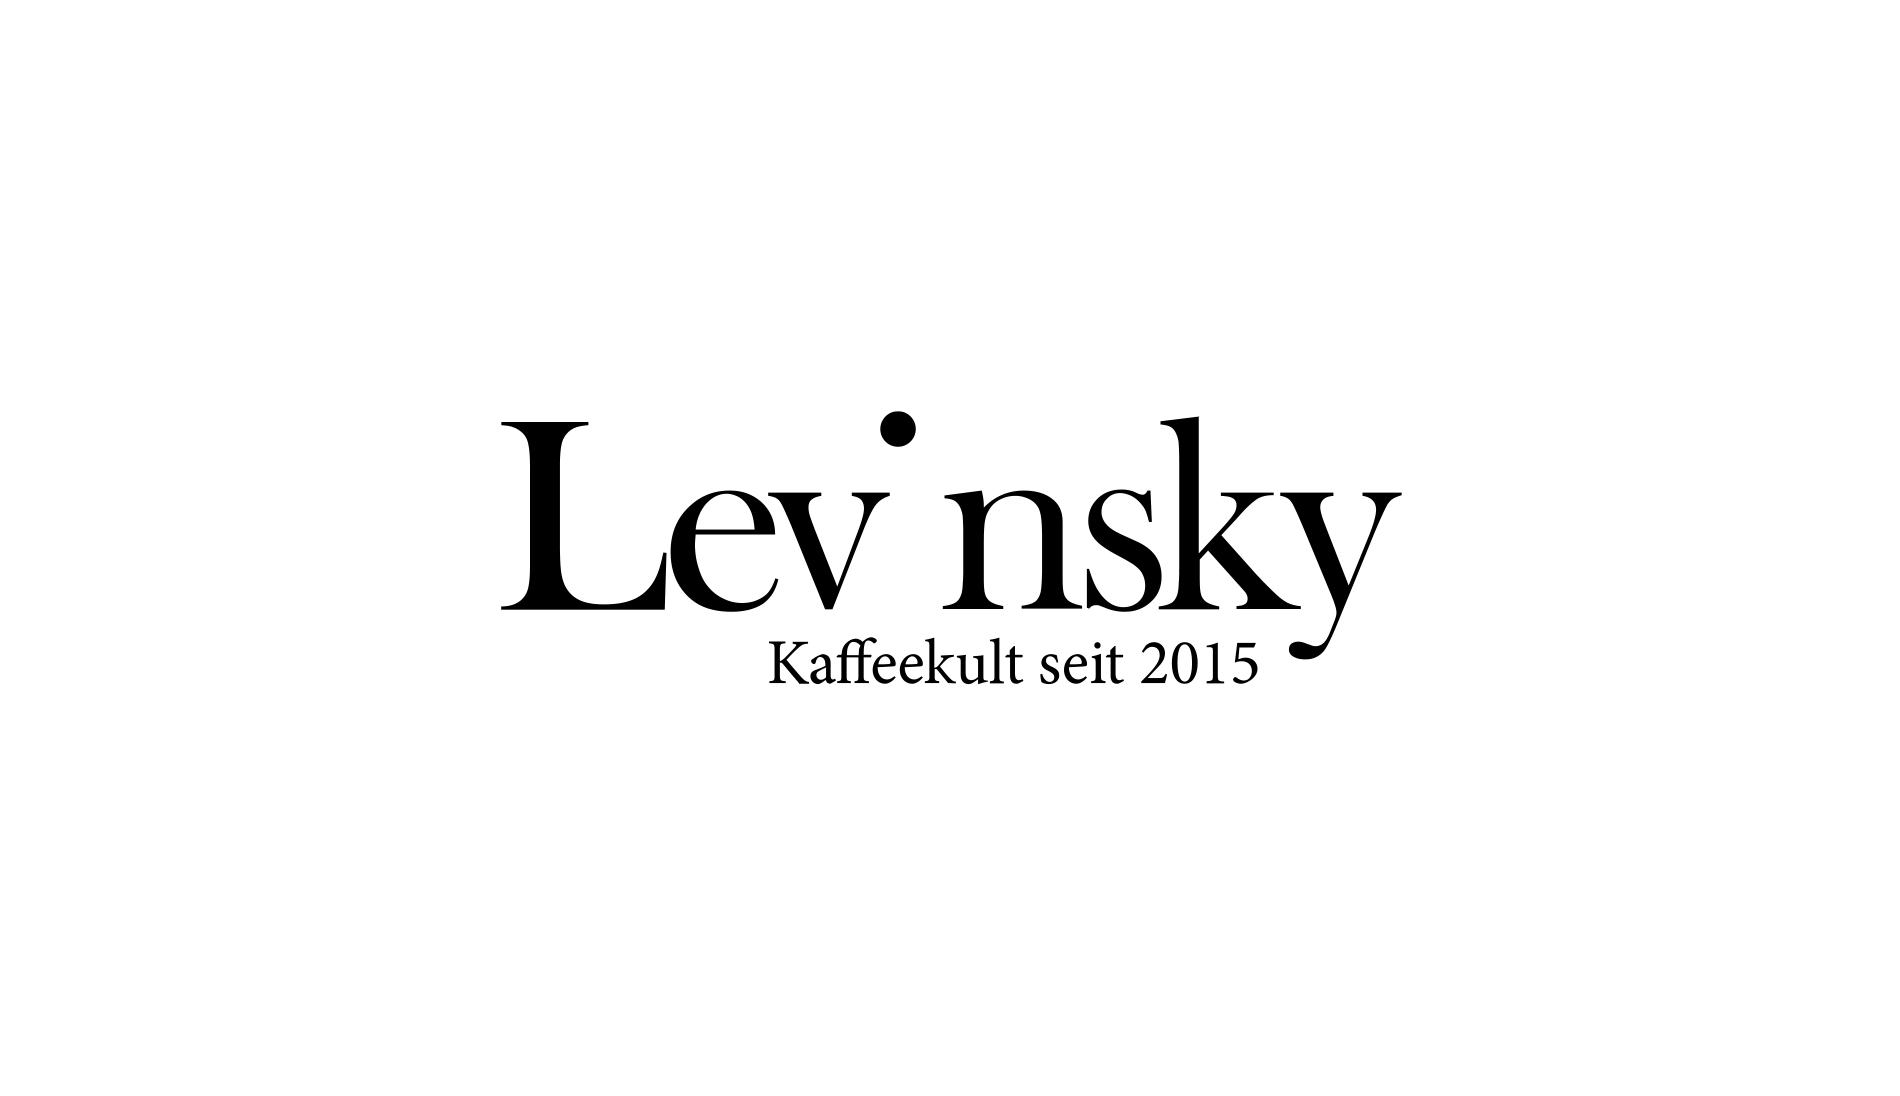 Levinsky Kaffee